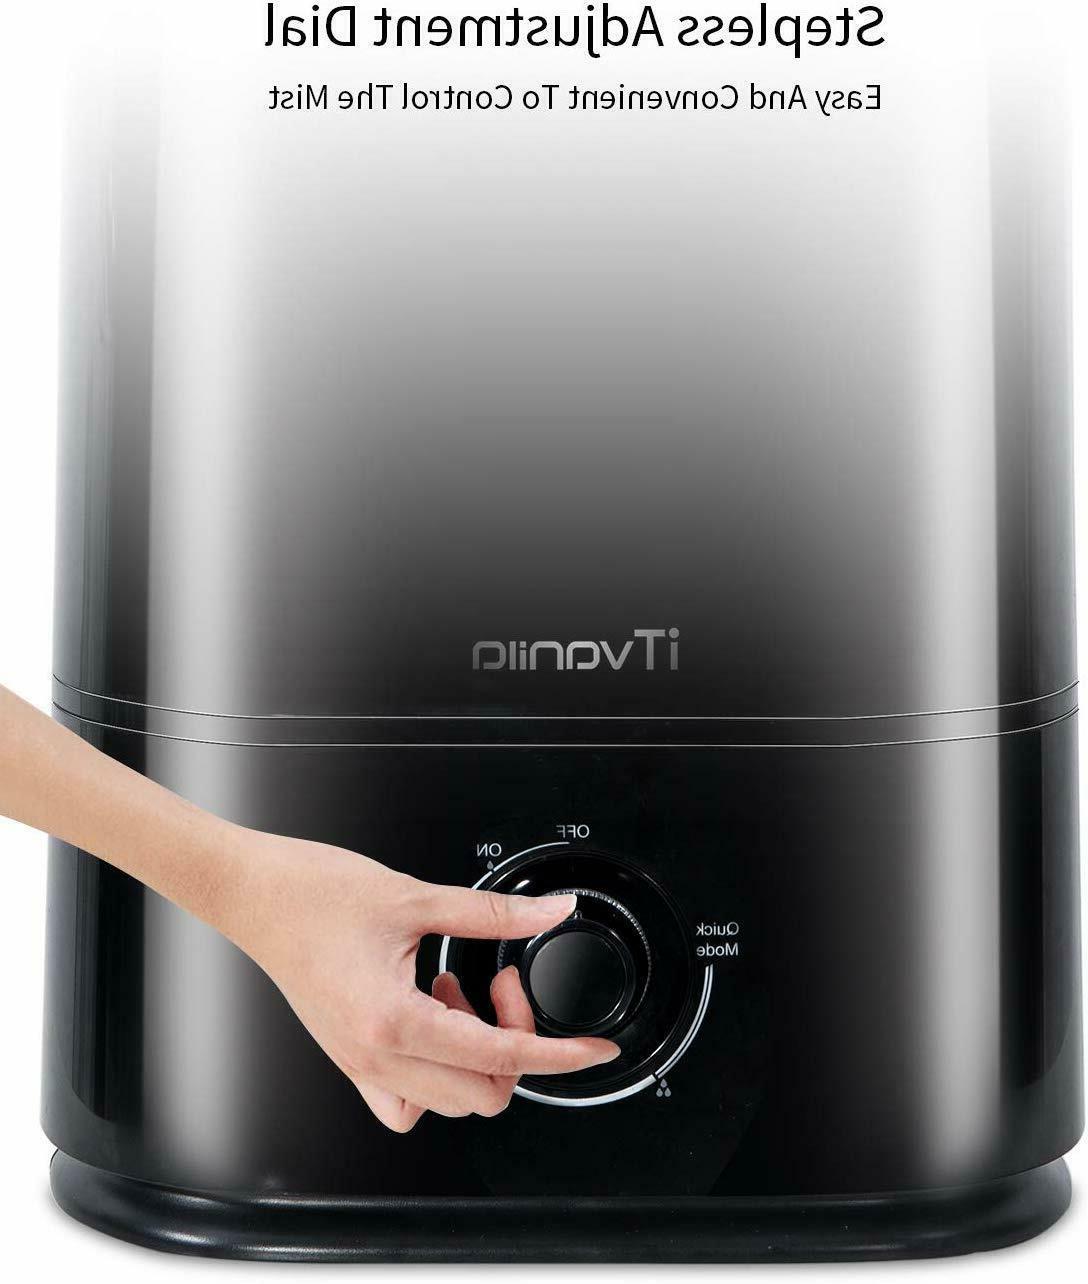 iTvanila Cool Humidifiers, 5L Large Room